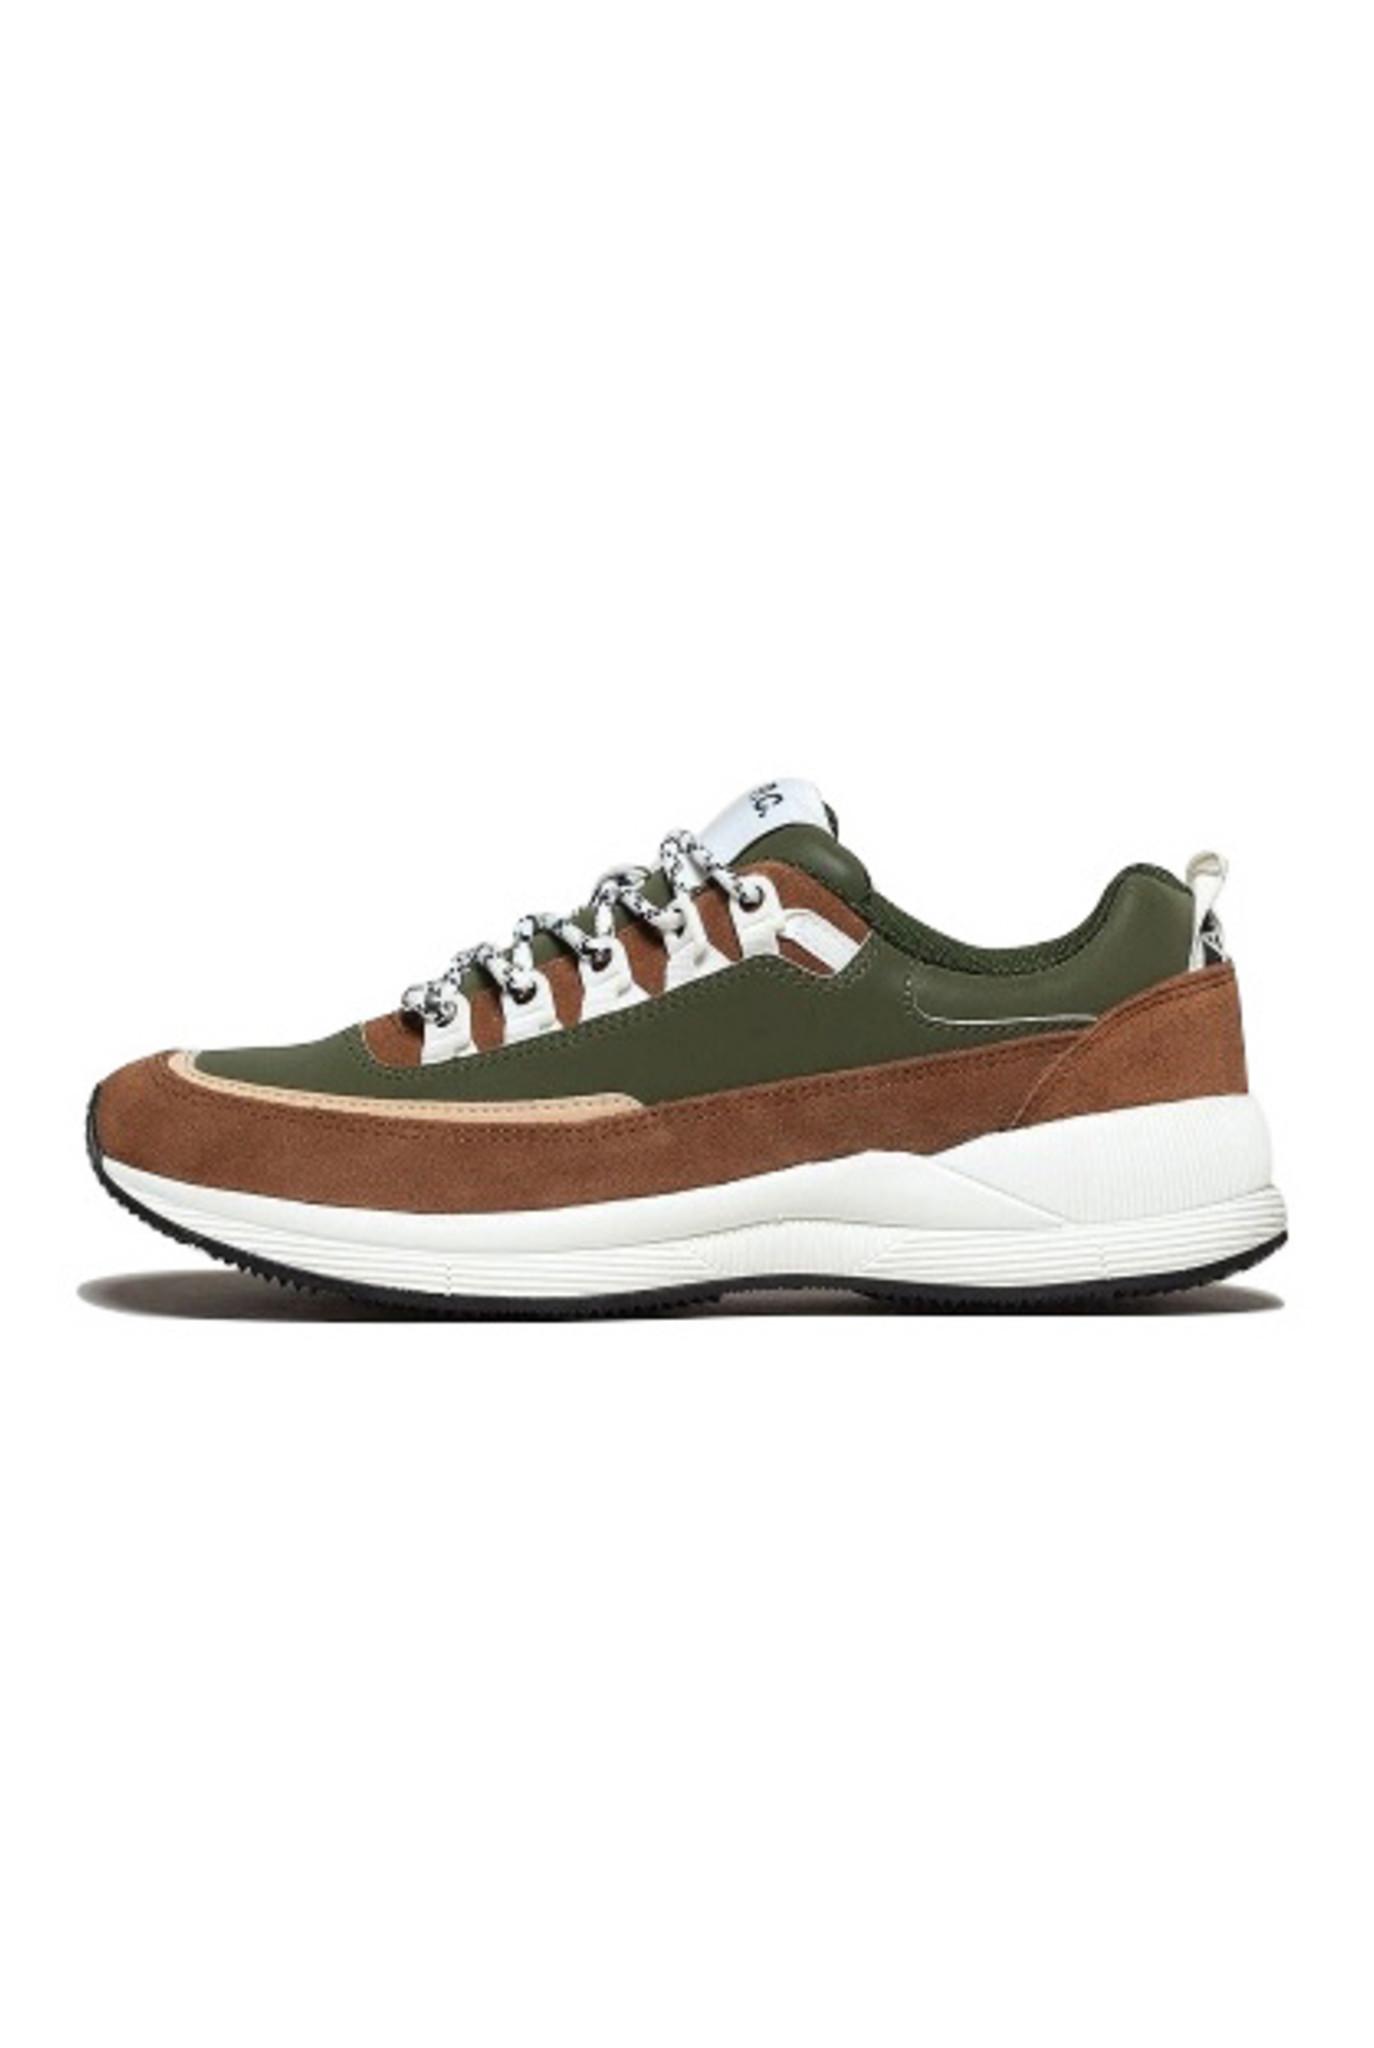 Jay sneakers Khaki